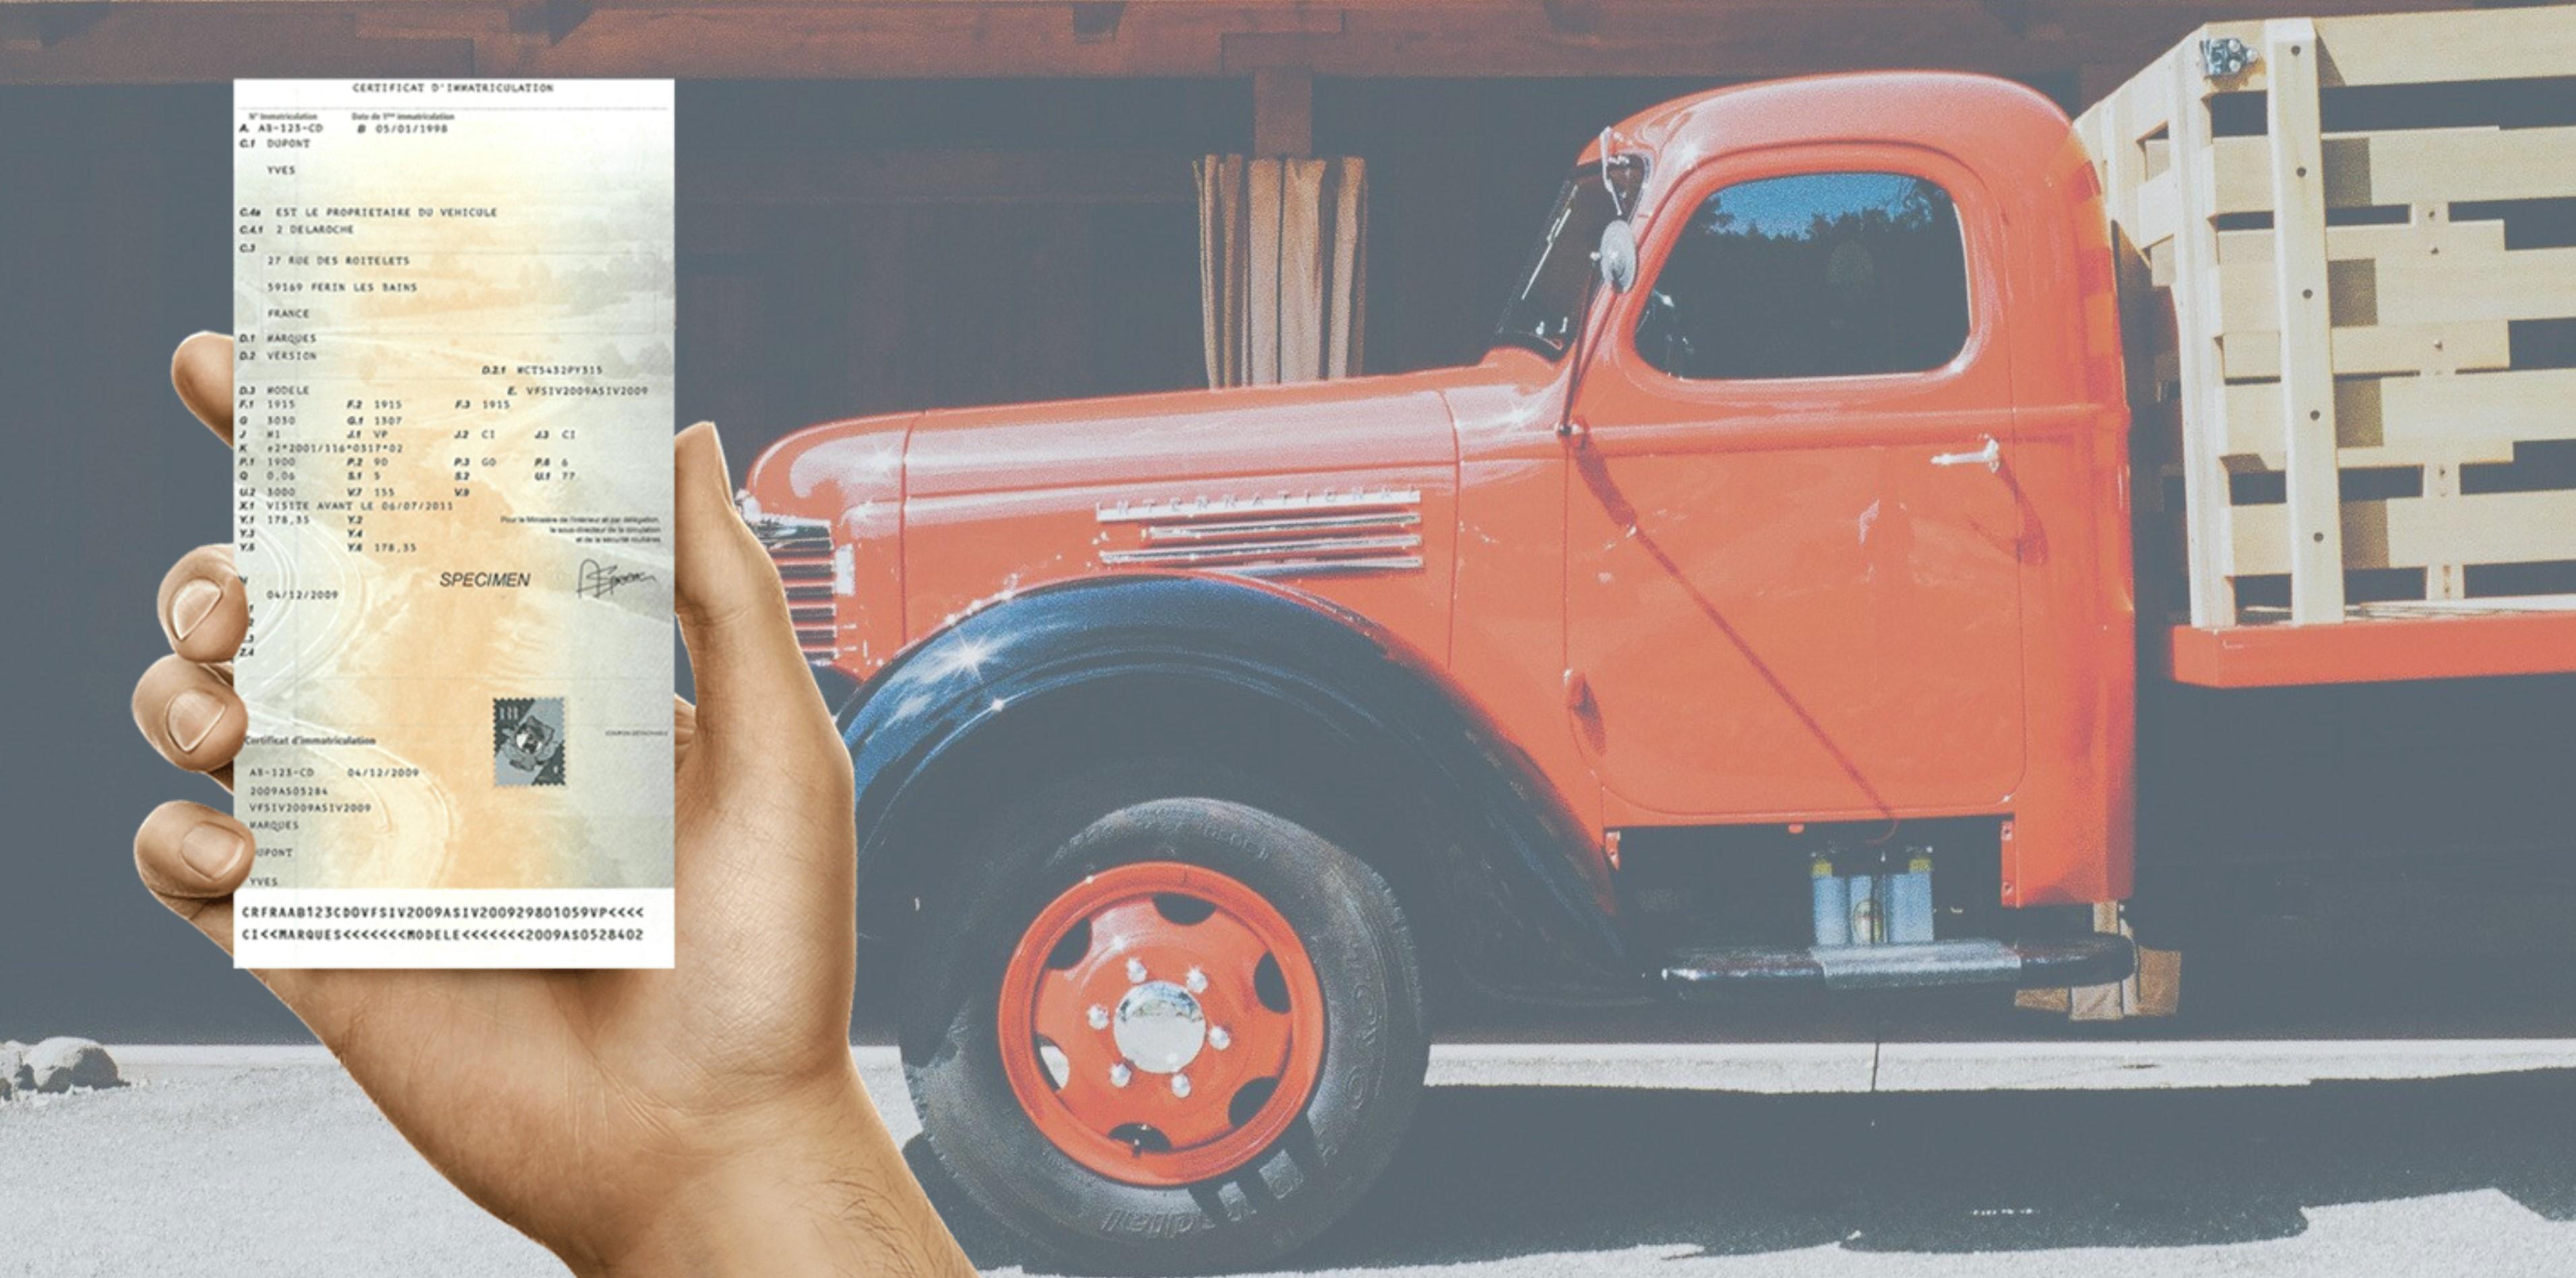 Duplicata carte grise camion